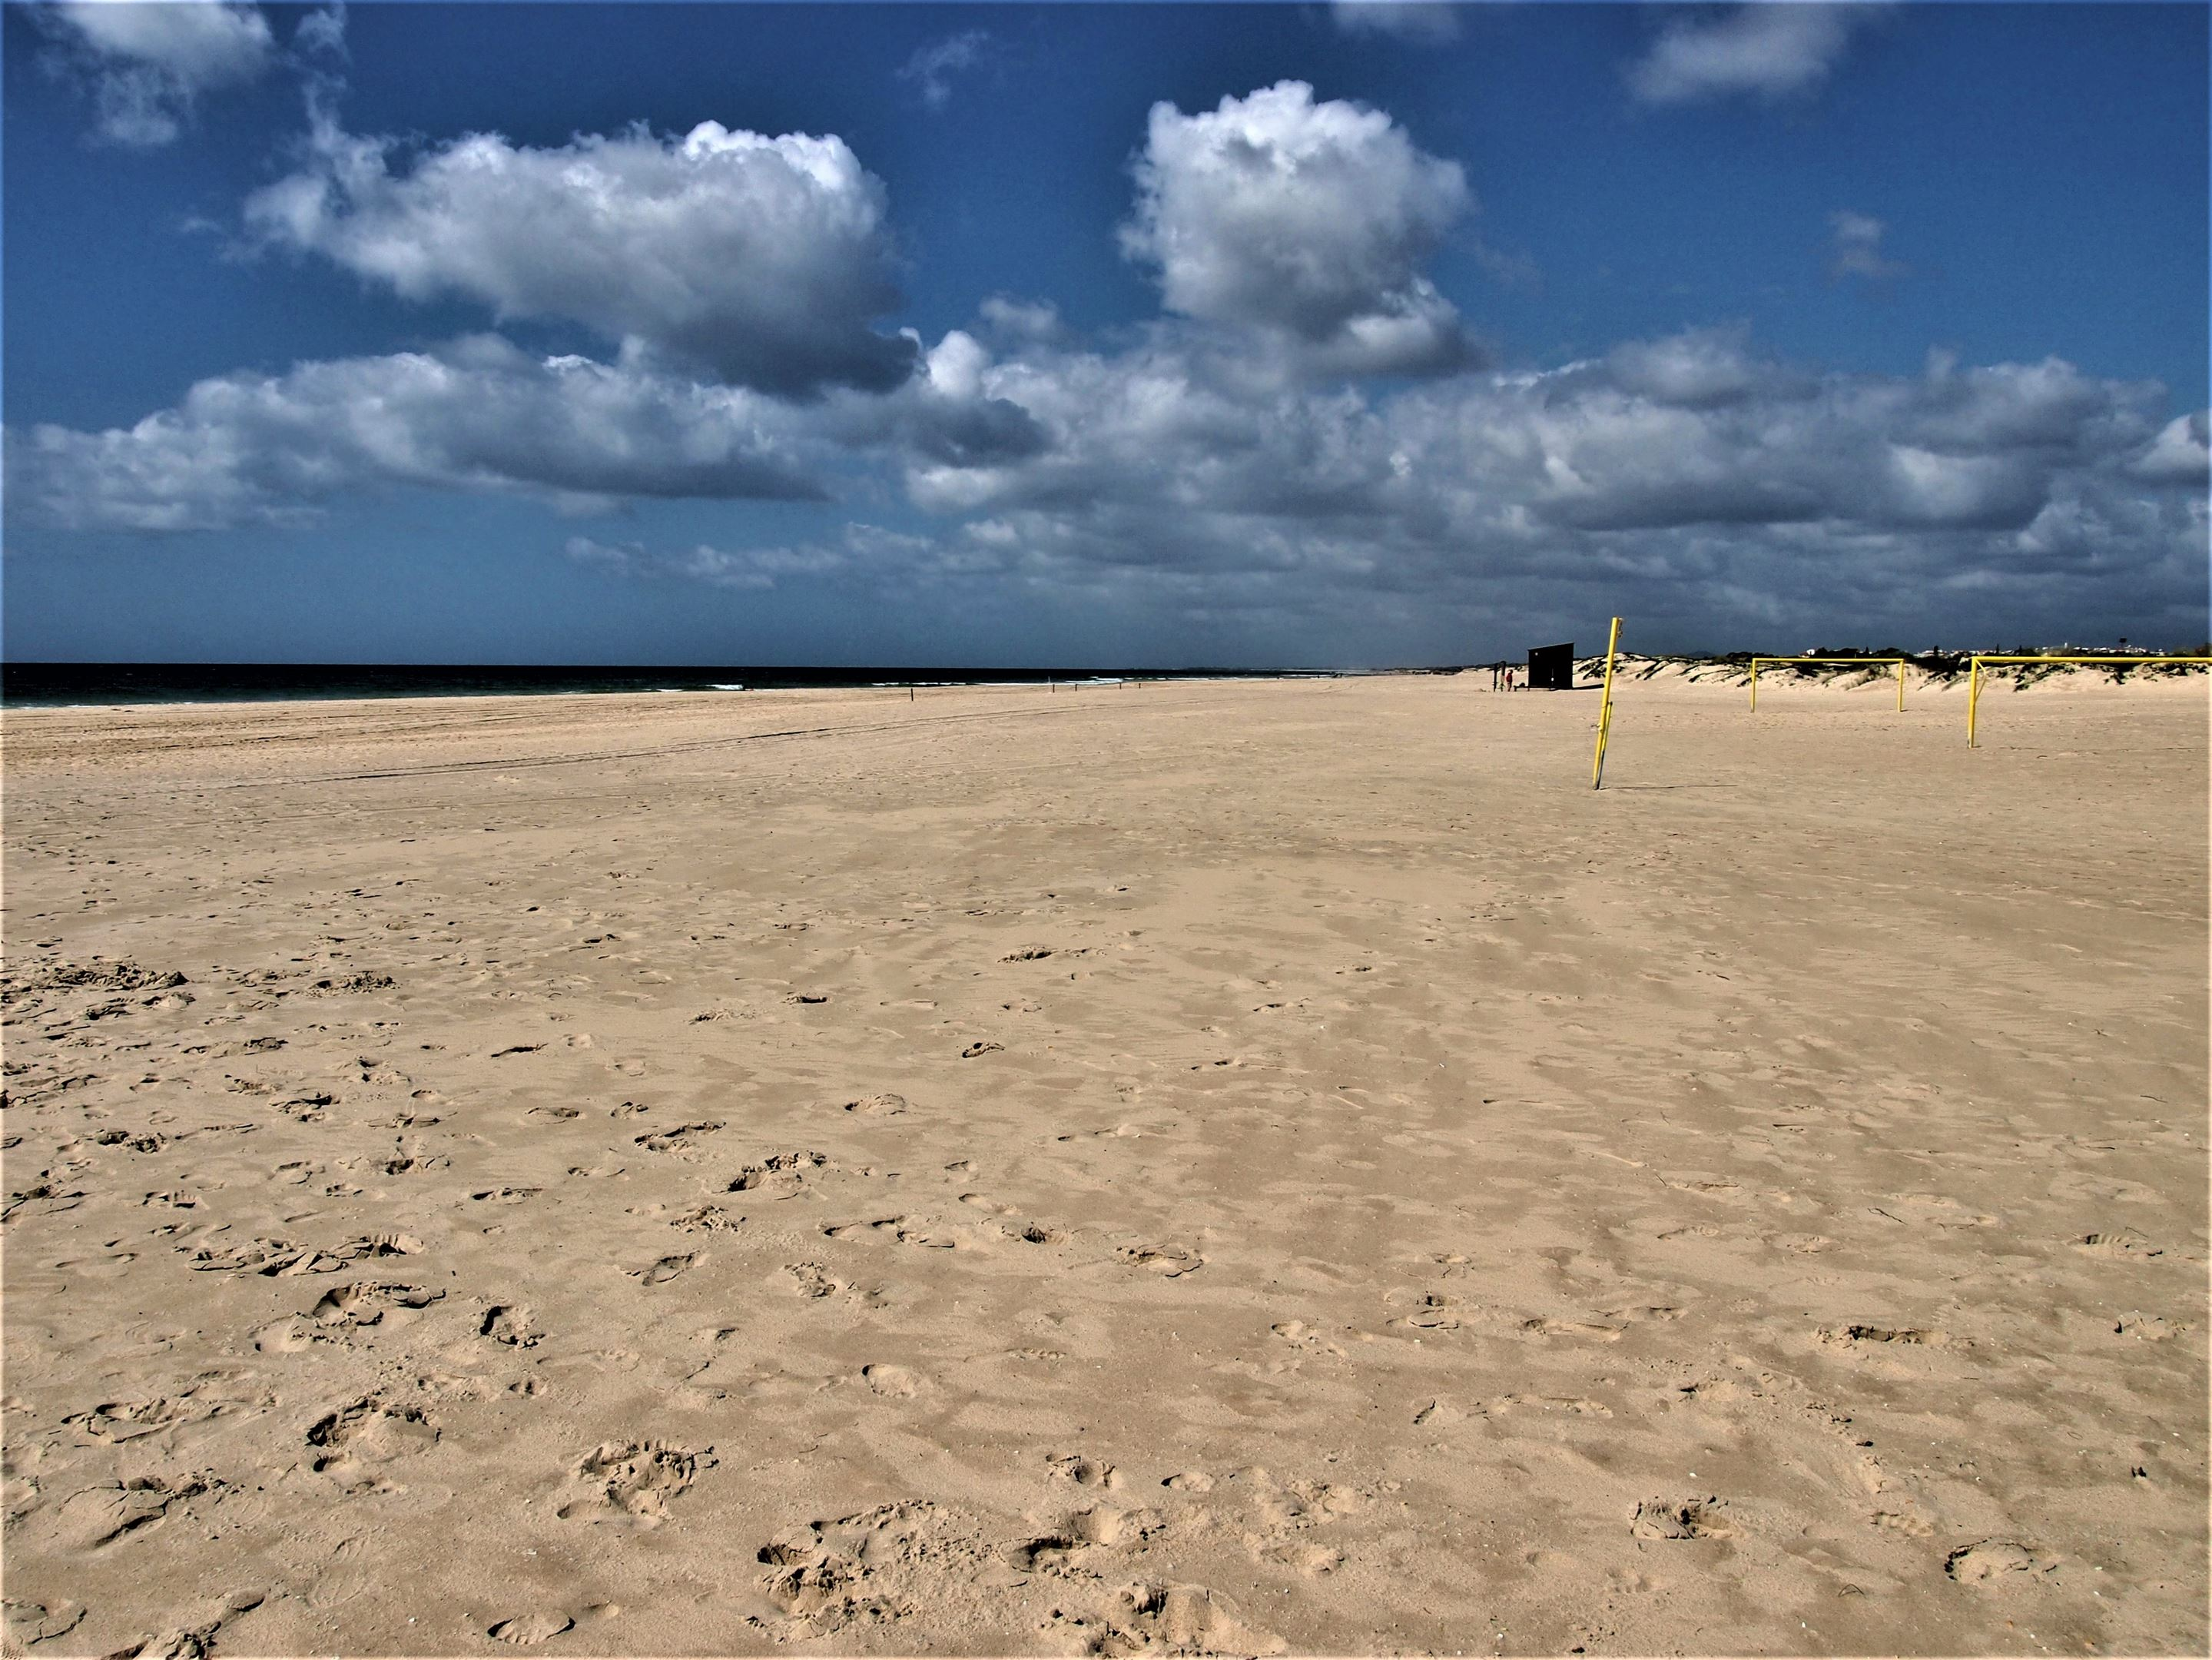 Praia da Alagoa, Castro Marim